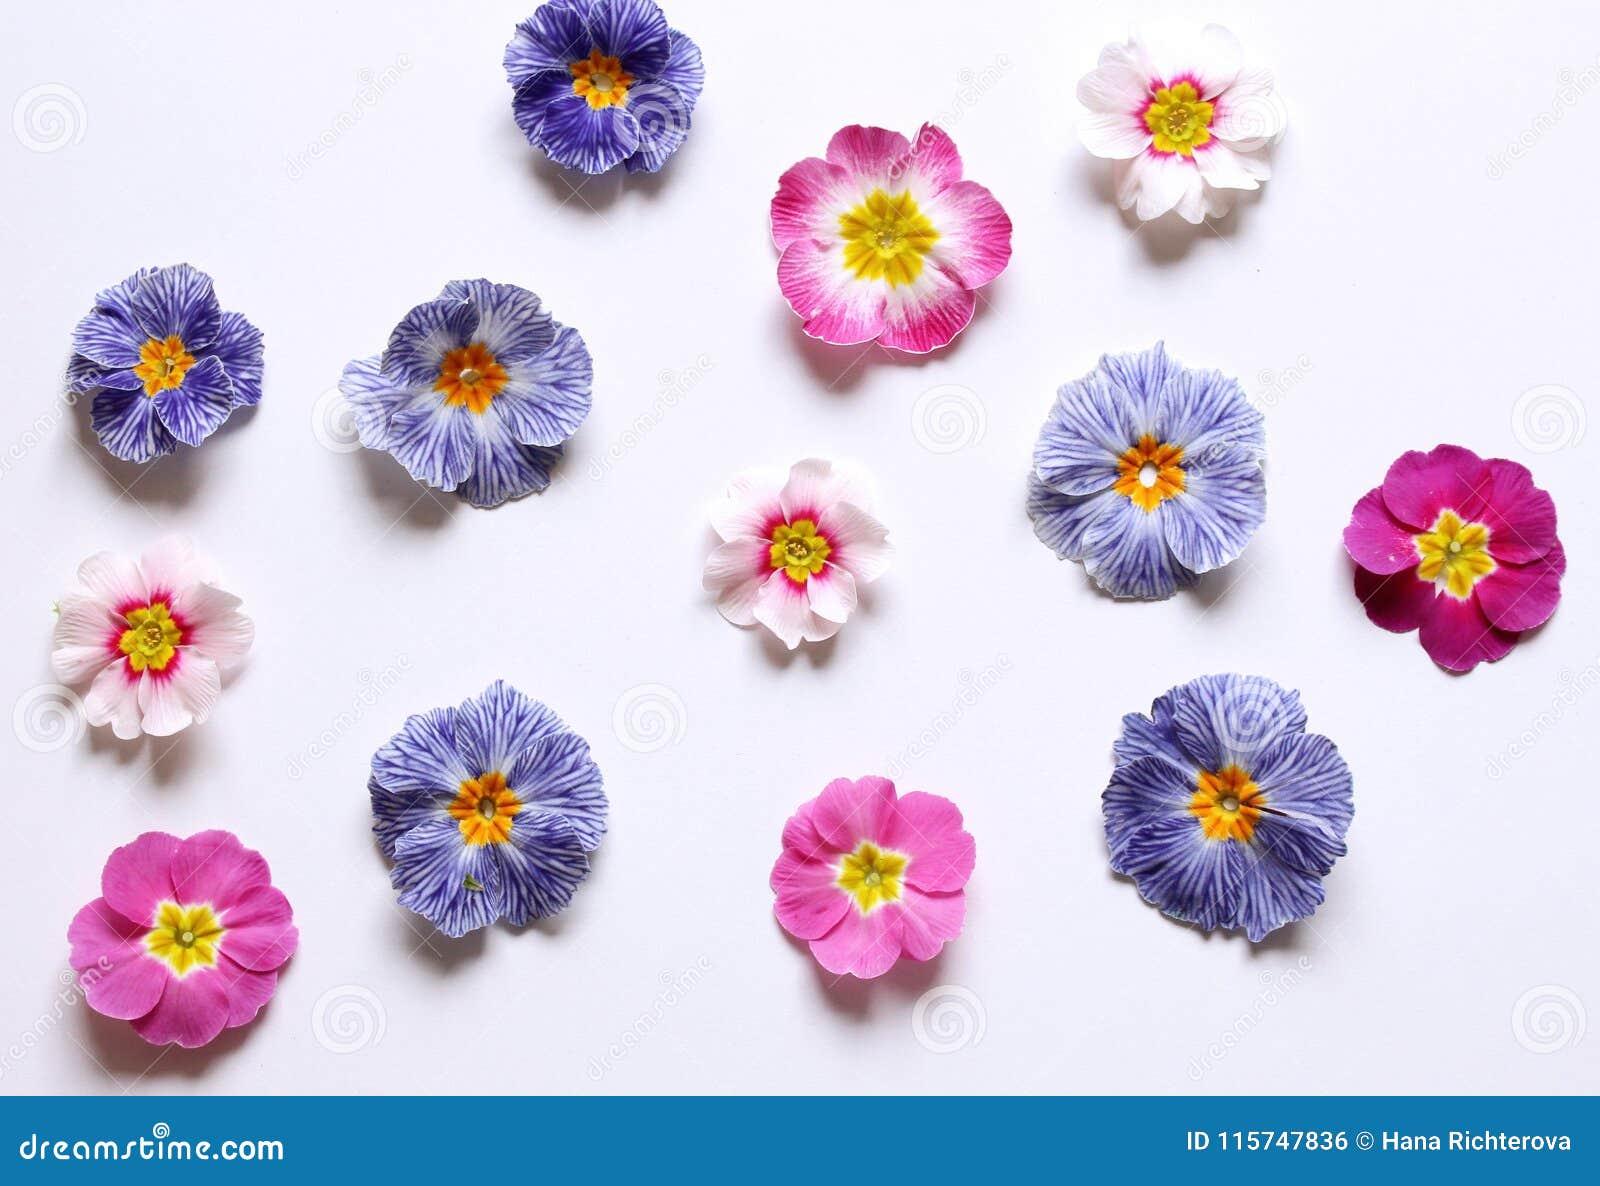 Samenstelling van Sleutelbloem, primula vulgaris bloemen op een witte achtergrond, hoogste mening, creatieve vlakke lay-out Het c